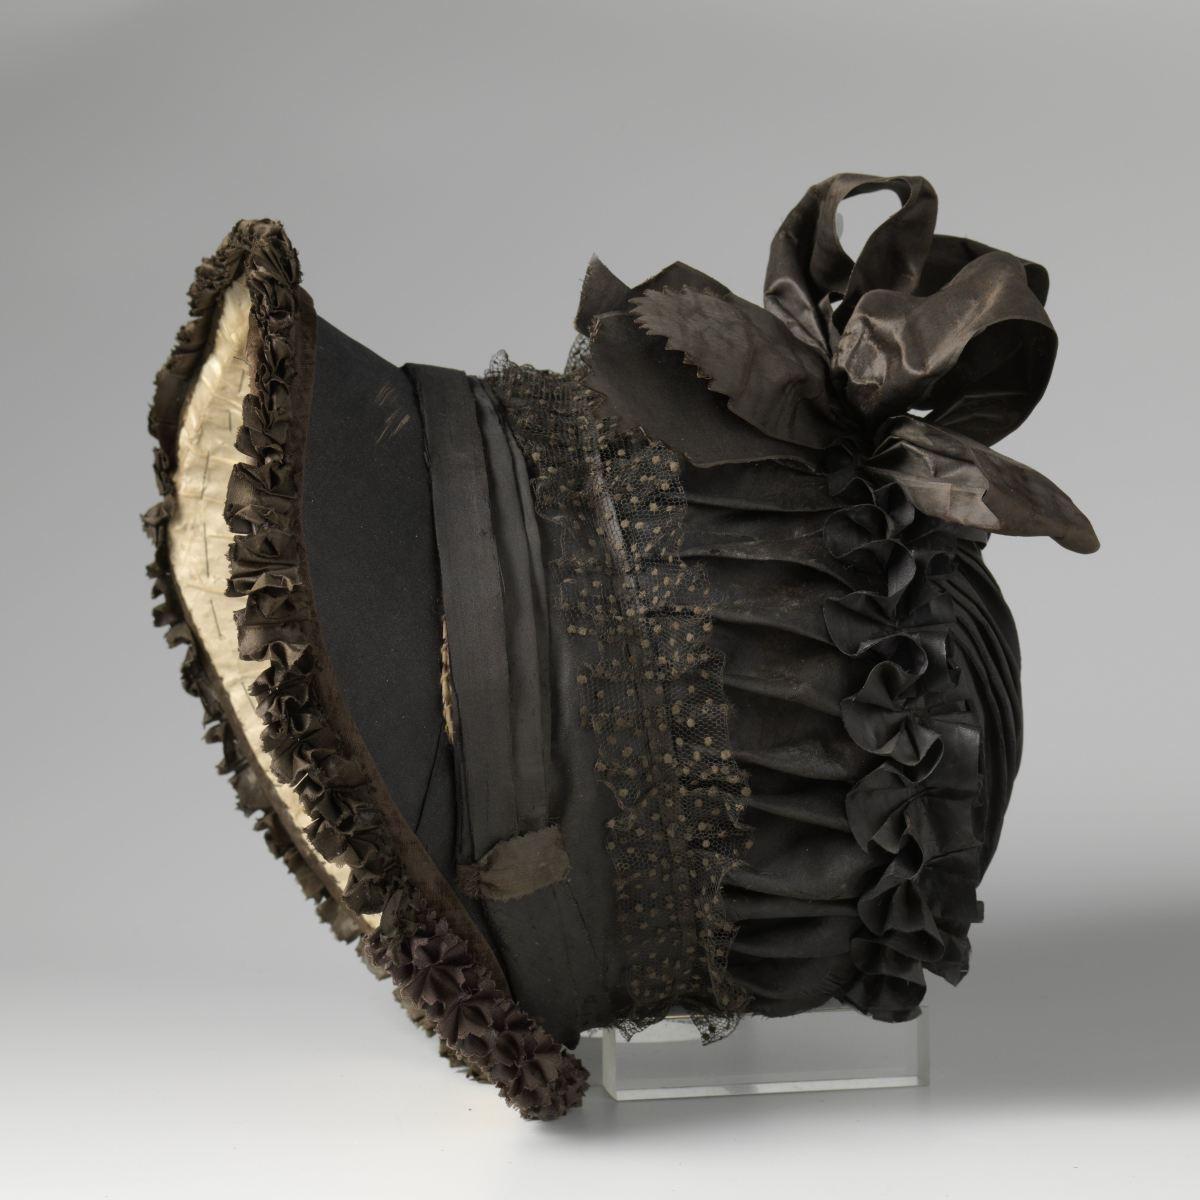 Poke bonnet - black silk with box pleated black silk band, ribbon, and black polka-dot tulle circa 1850 - 1820